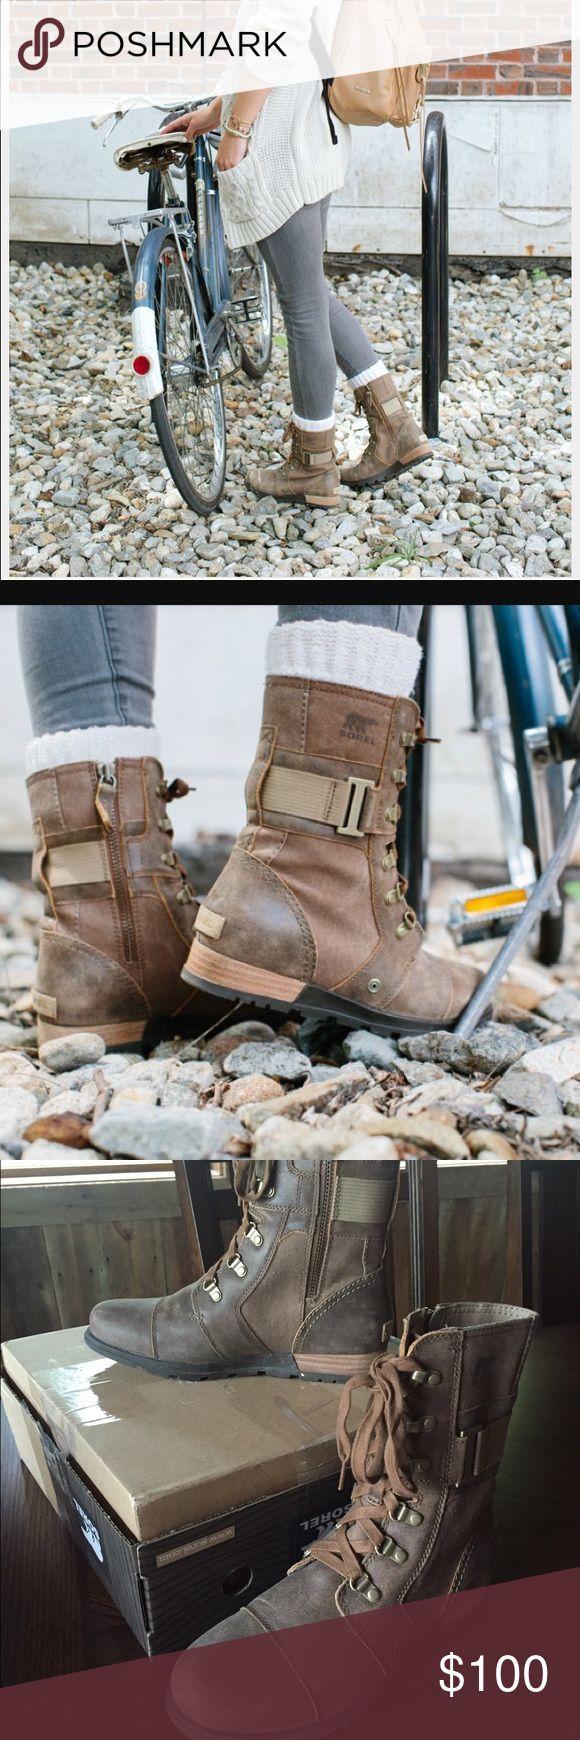 Sorel Major Carly size 8.5 Sorel Major Carly boot in excellent condition. Sorel Shoes Combat & Moto Boots